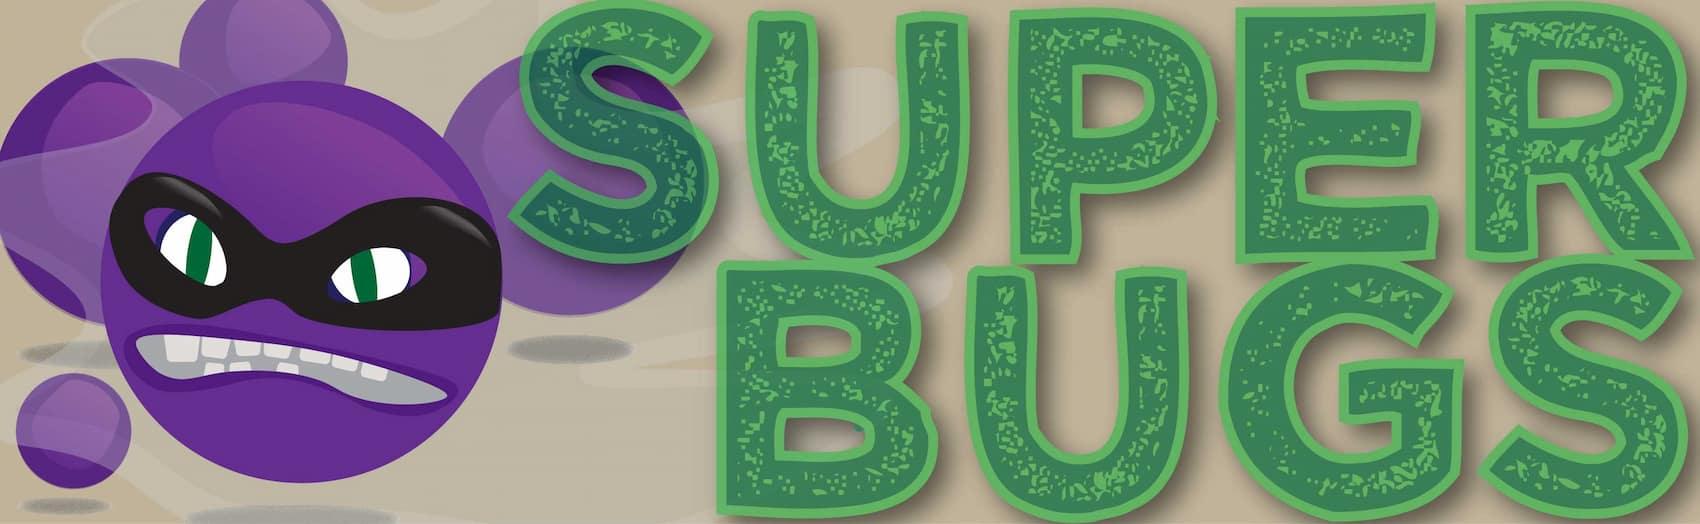 Superbug-01